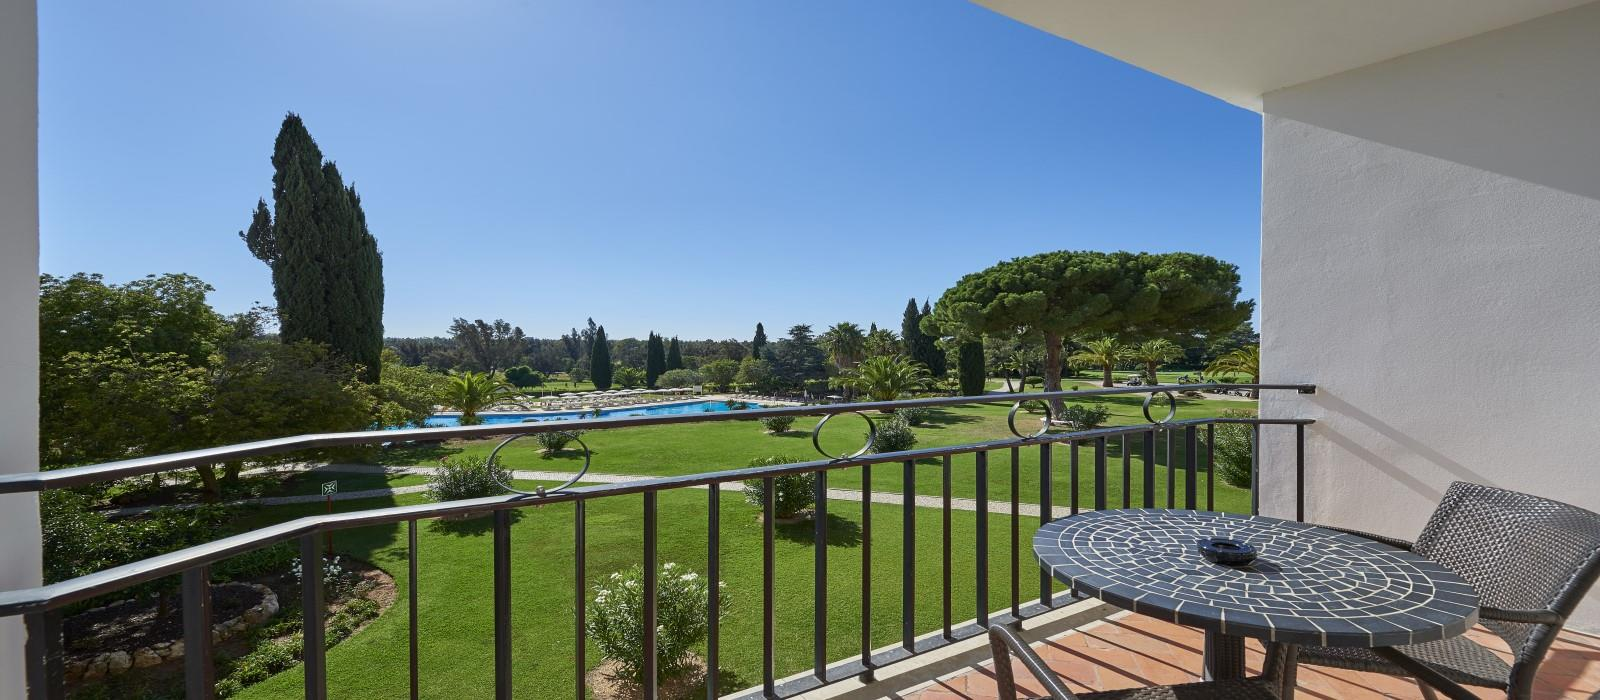 Penina Hotel & Golf Resort 5* - 5 Nights Bed & Breakfast, 5 Rounds